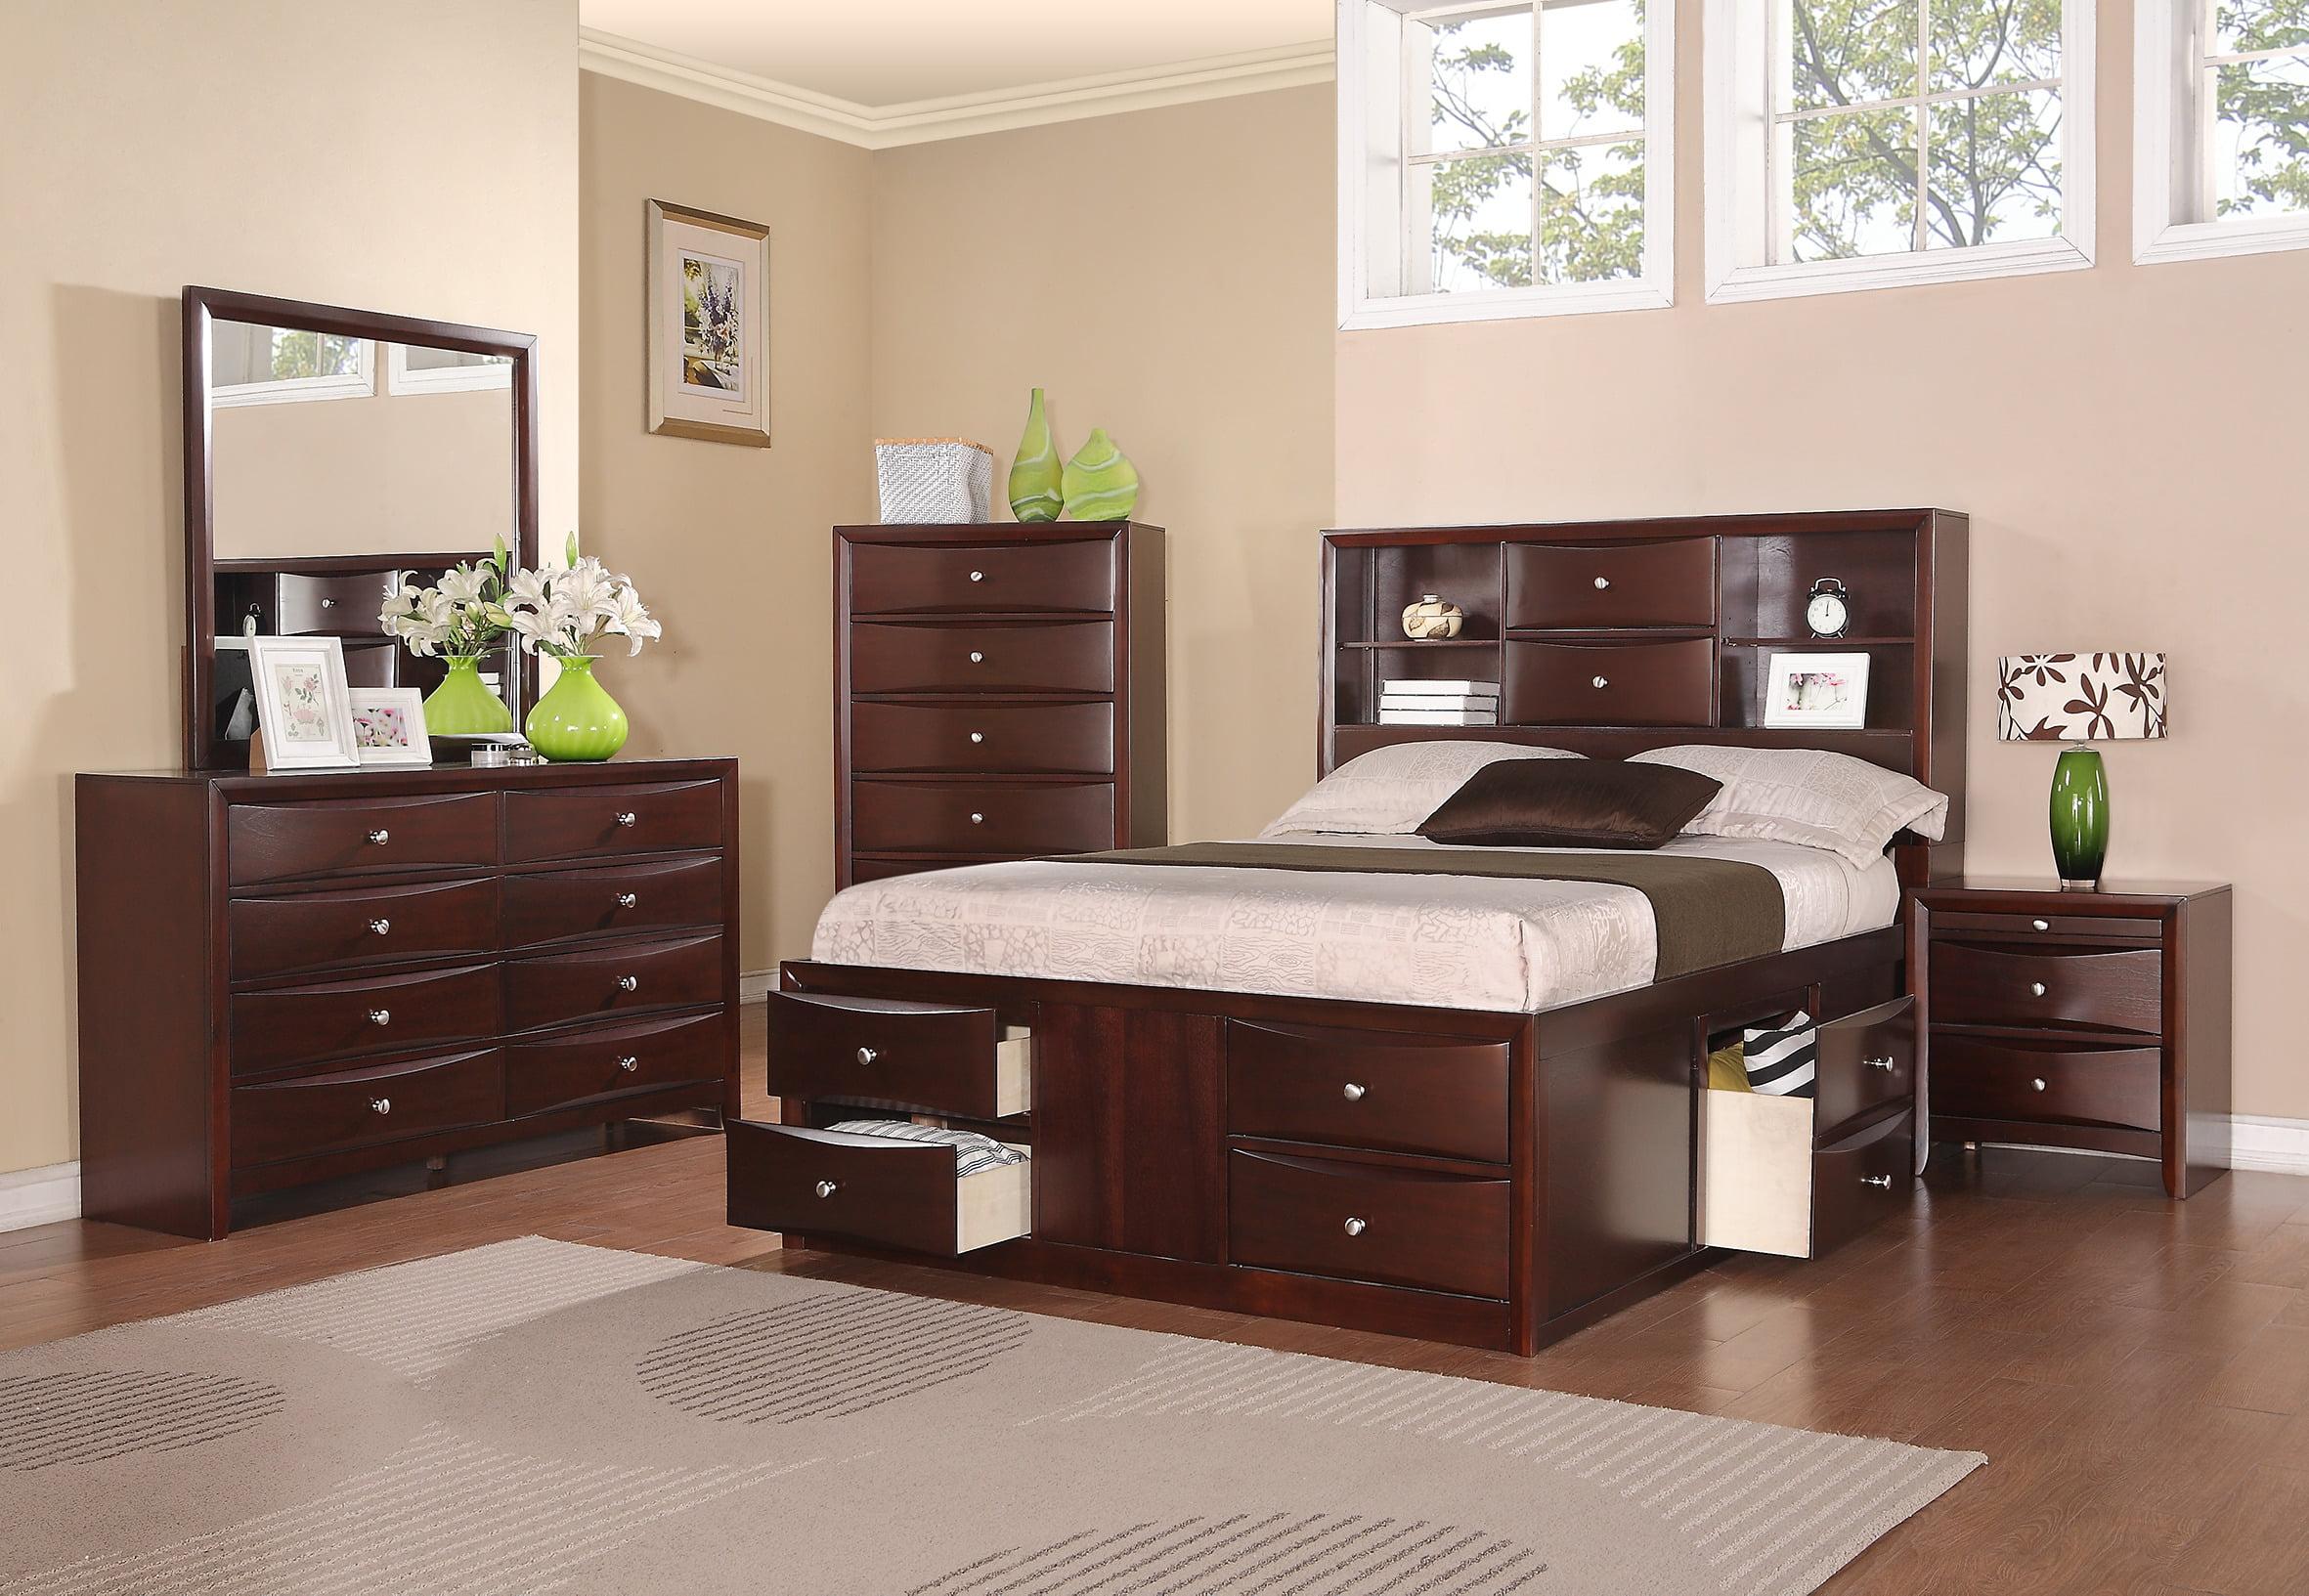 Bedroom Furniture Storage Drawers HB FB California King Size Bed Dresser  Mirror Nightstand 4pc Set Pine Wood Espresso Modern Set